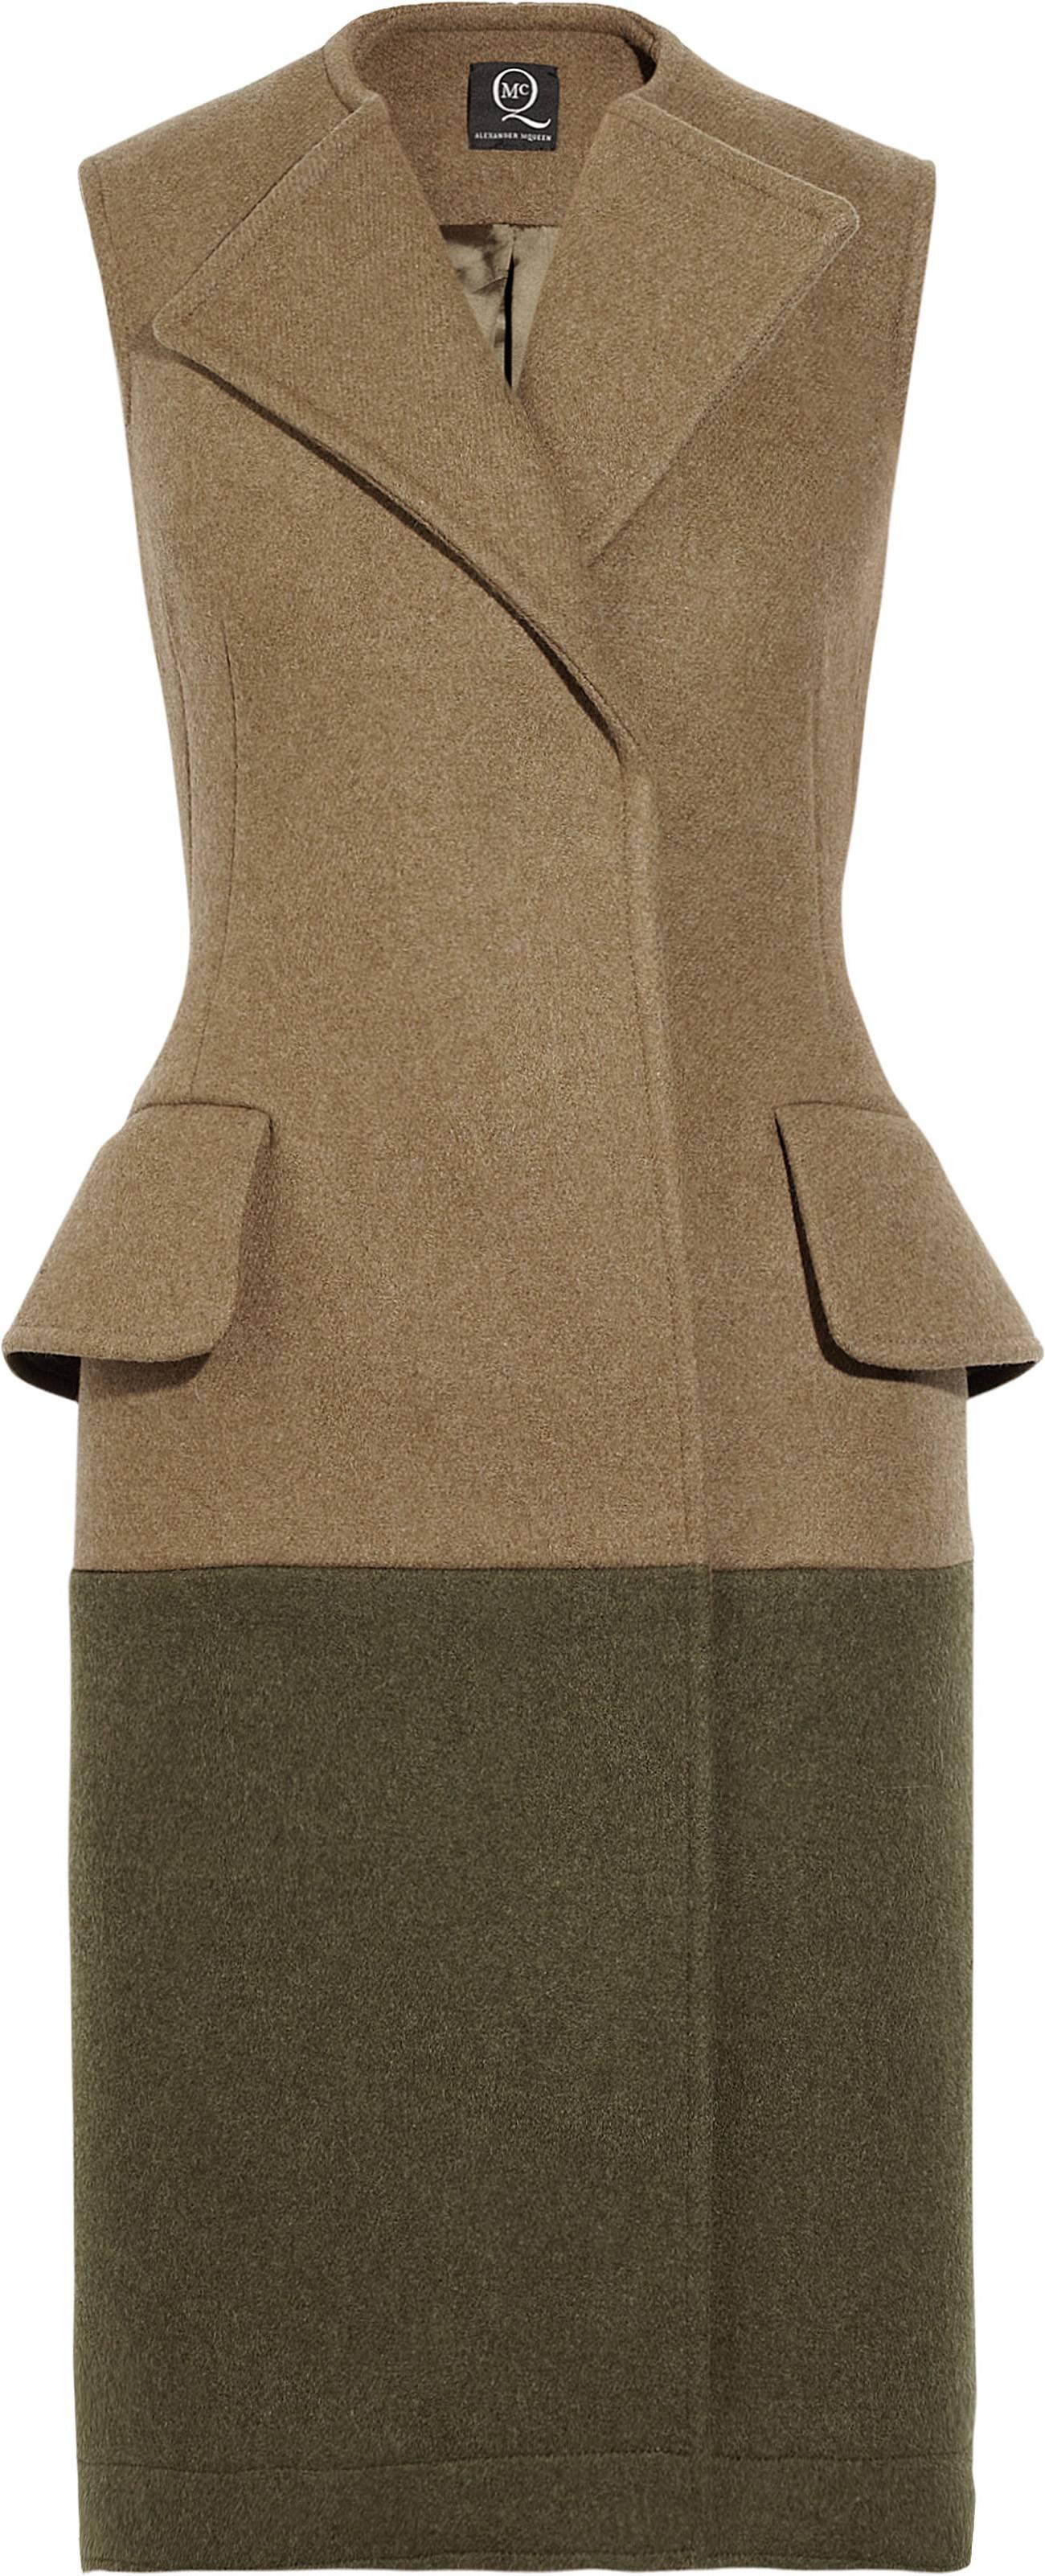 322562_McQ Alexander McQueen Two-tone coat dress NET-A-PORTER